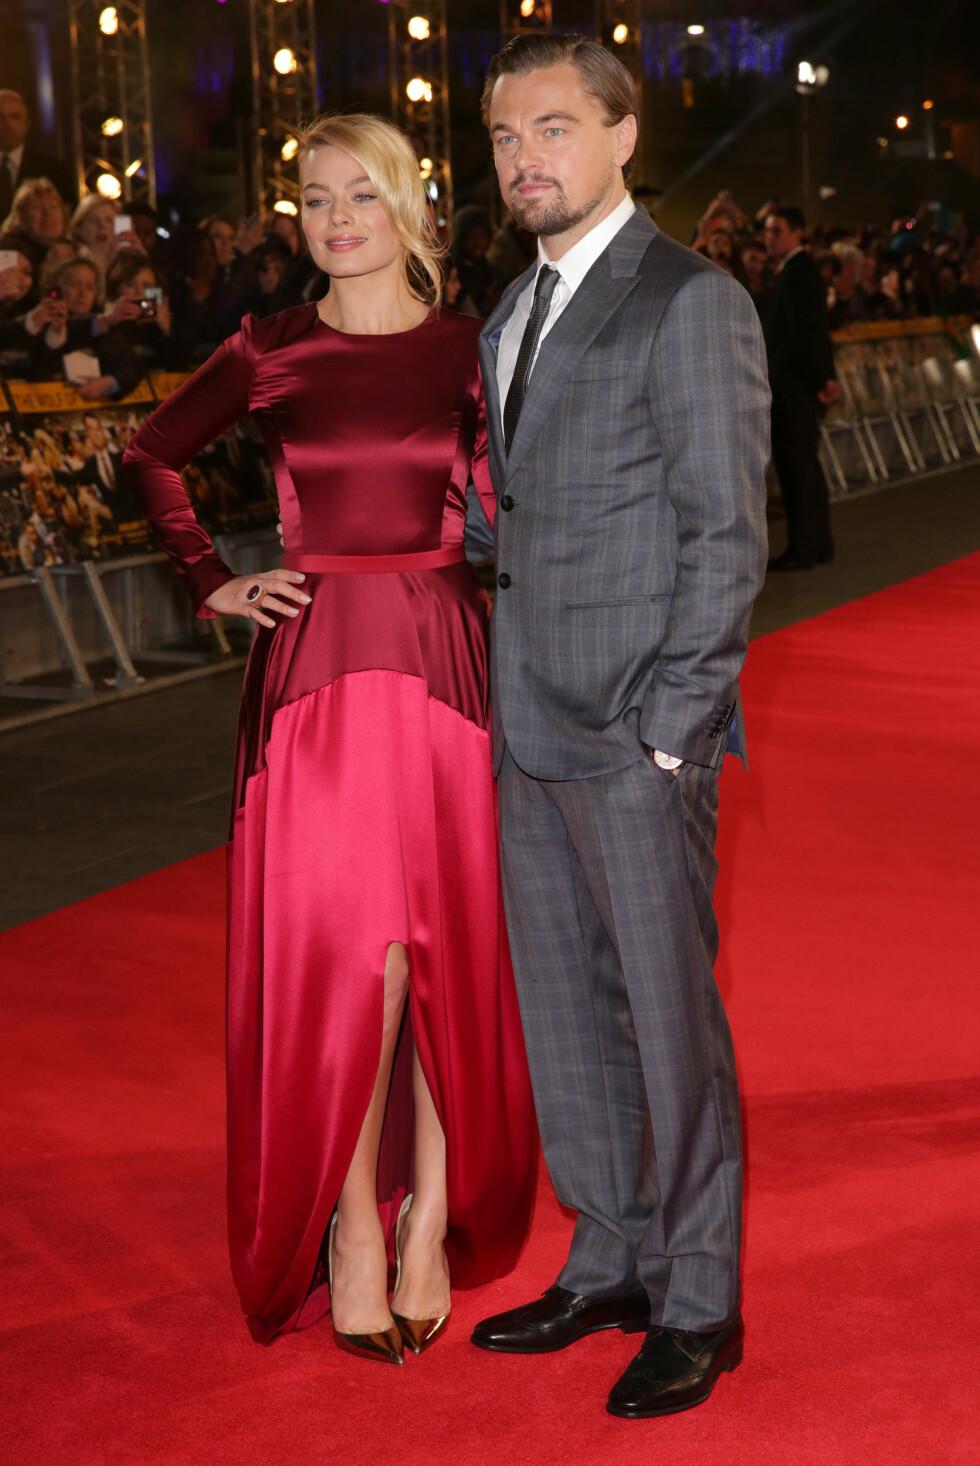 Margot Robbie og Leonardo DiCapriopå Wolf of Wall Street-premiere. Foto: REX/Richard Young/All Over Press